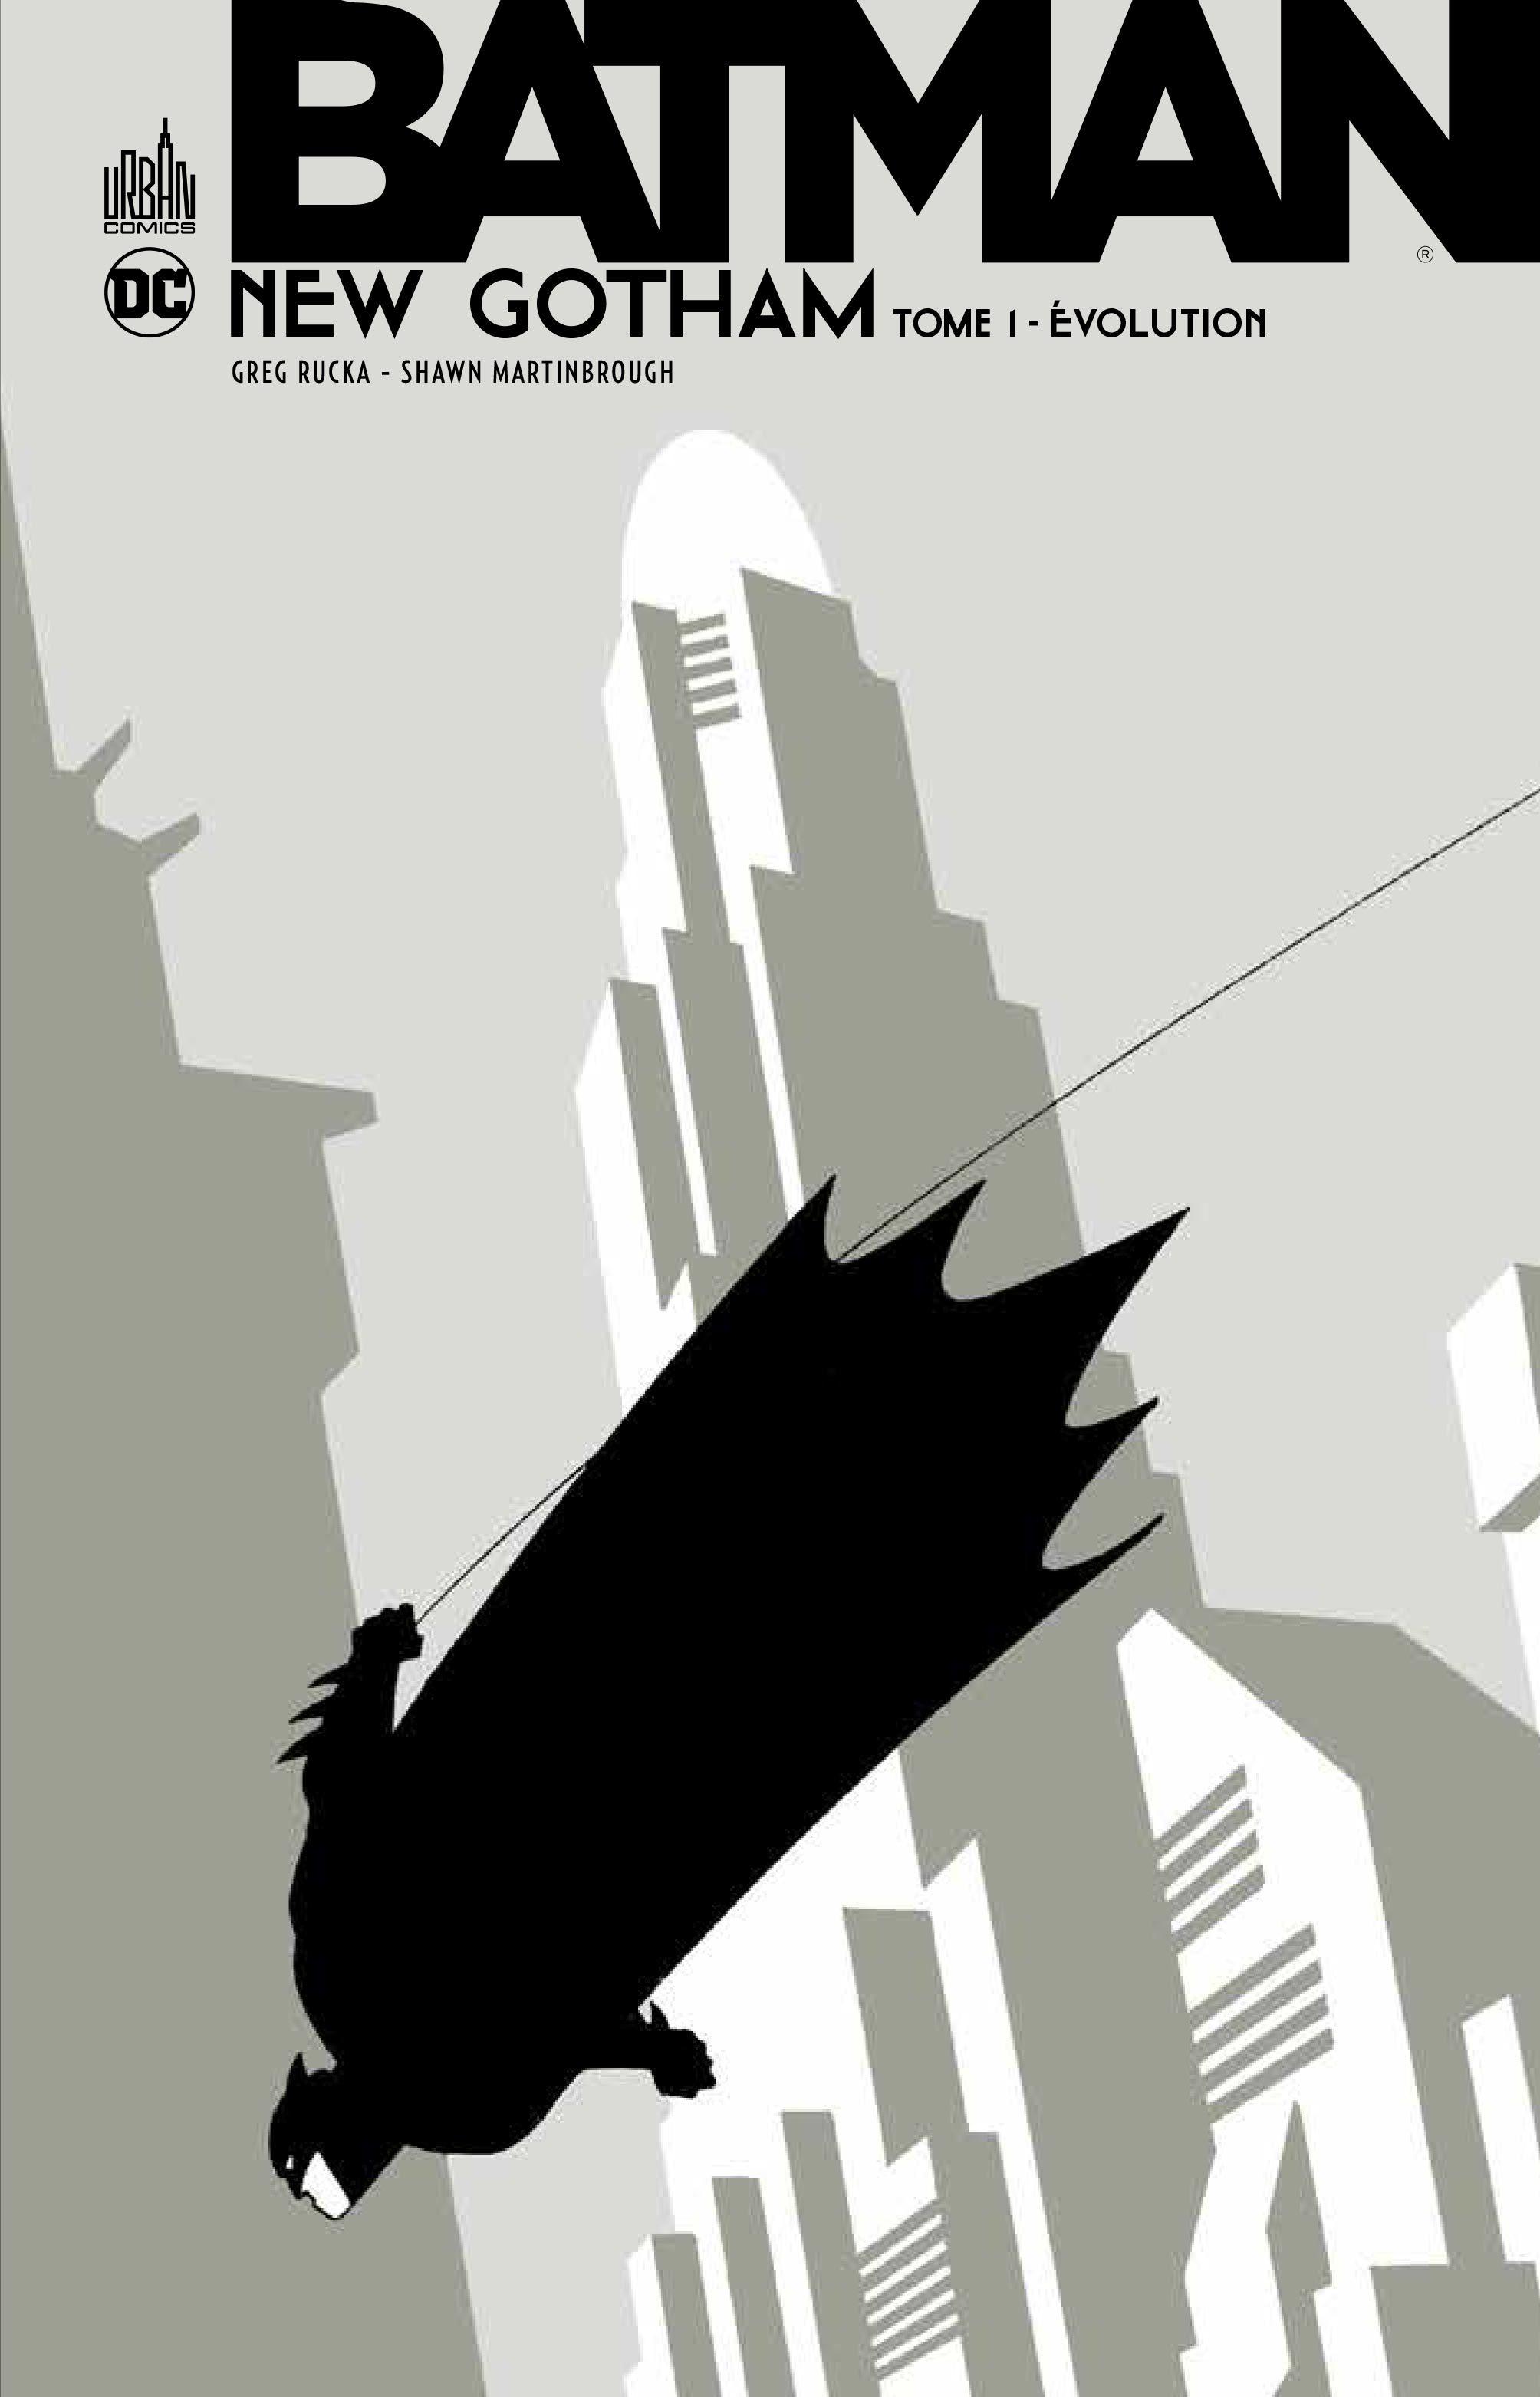 BATMAN NEW GOTHAM TOME 1